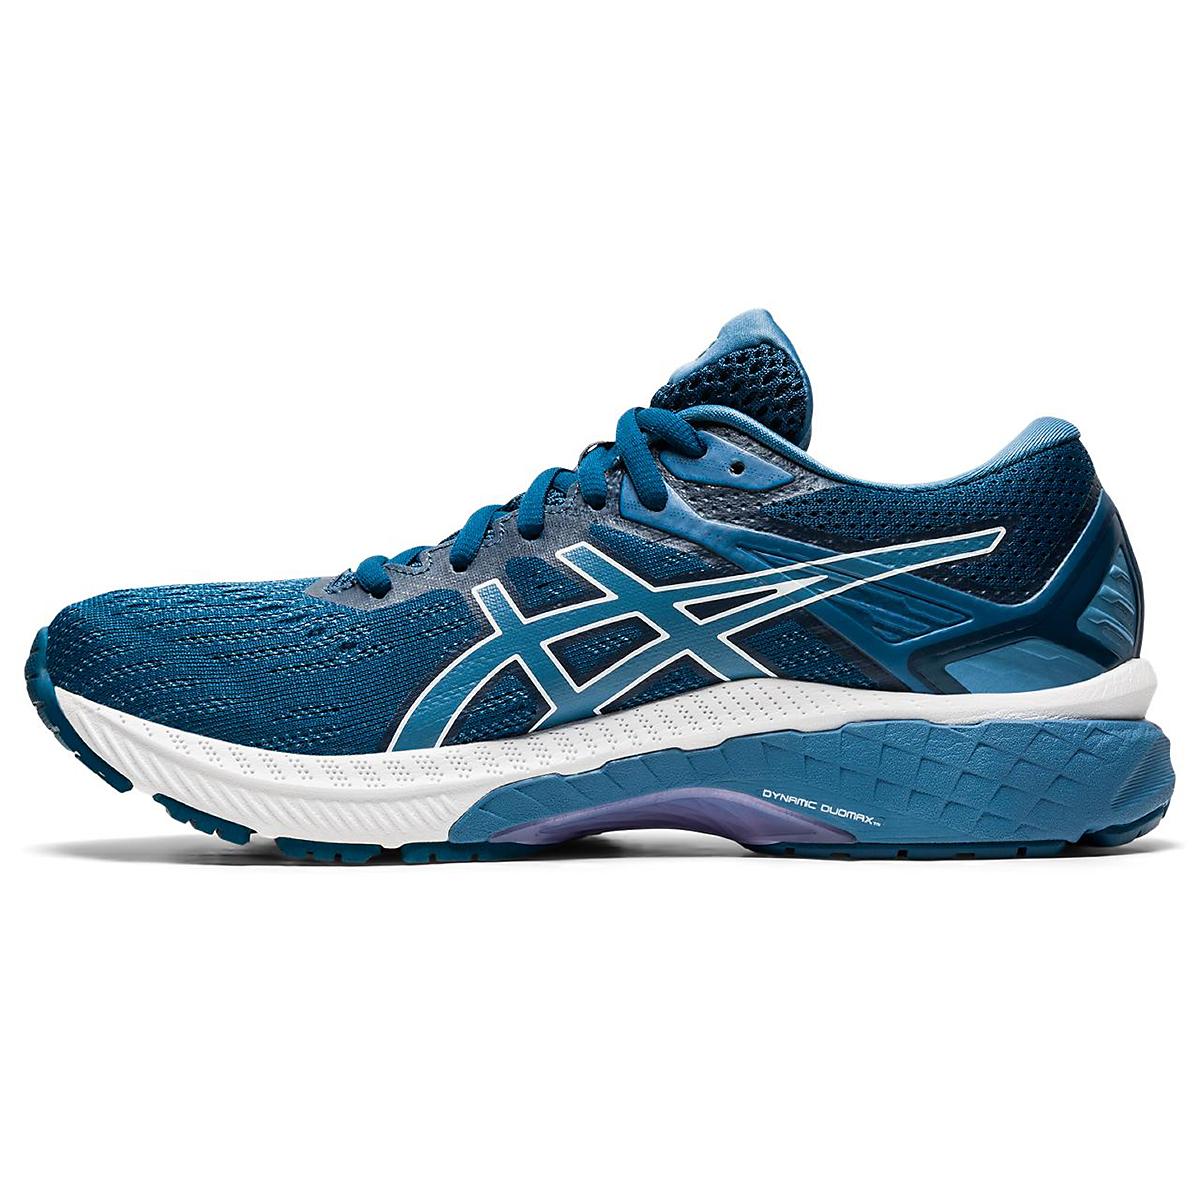 Women's Asics Gt-2000 9 Running Shoe - Color: Mako Blue/Grey Floss - Size: 5 - Width: Regular, Mako Blue/Grey Floss, large, image 2